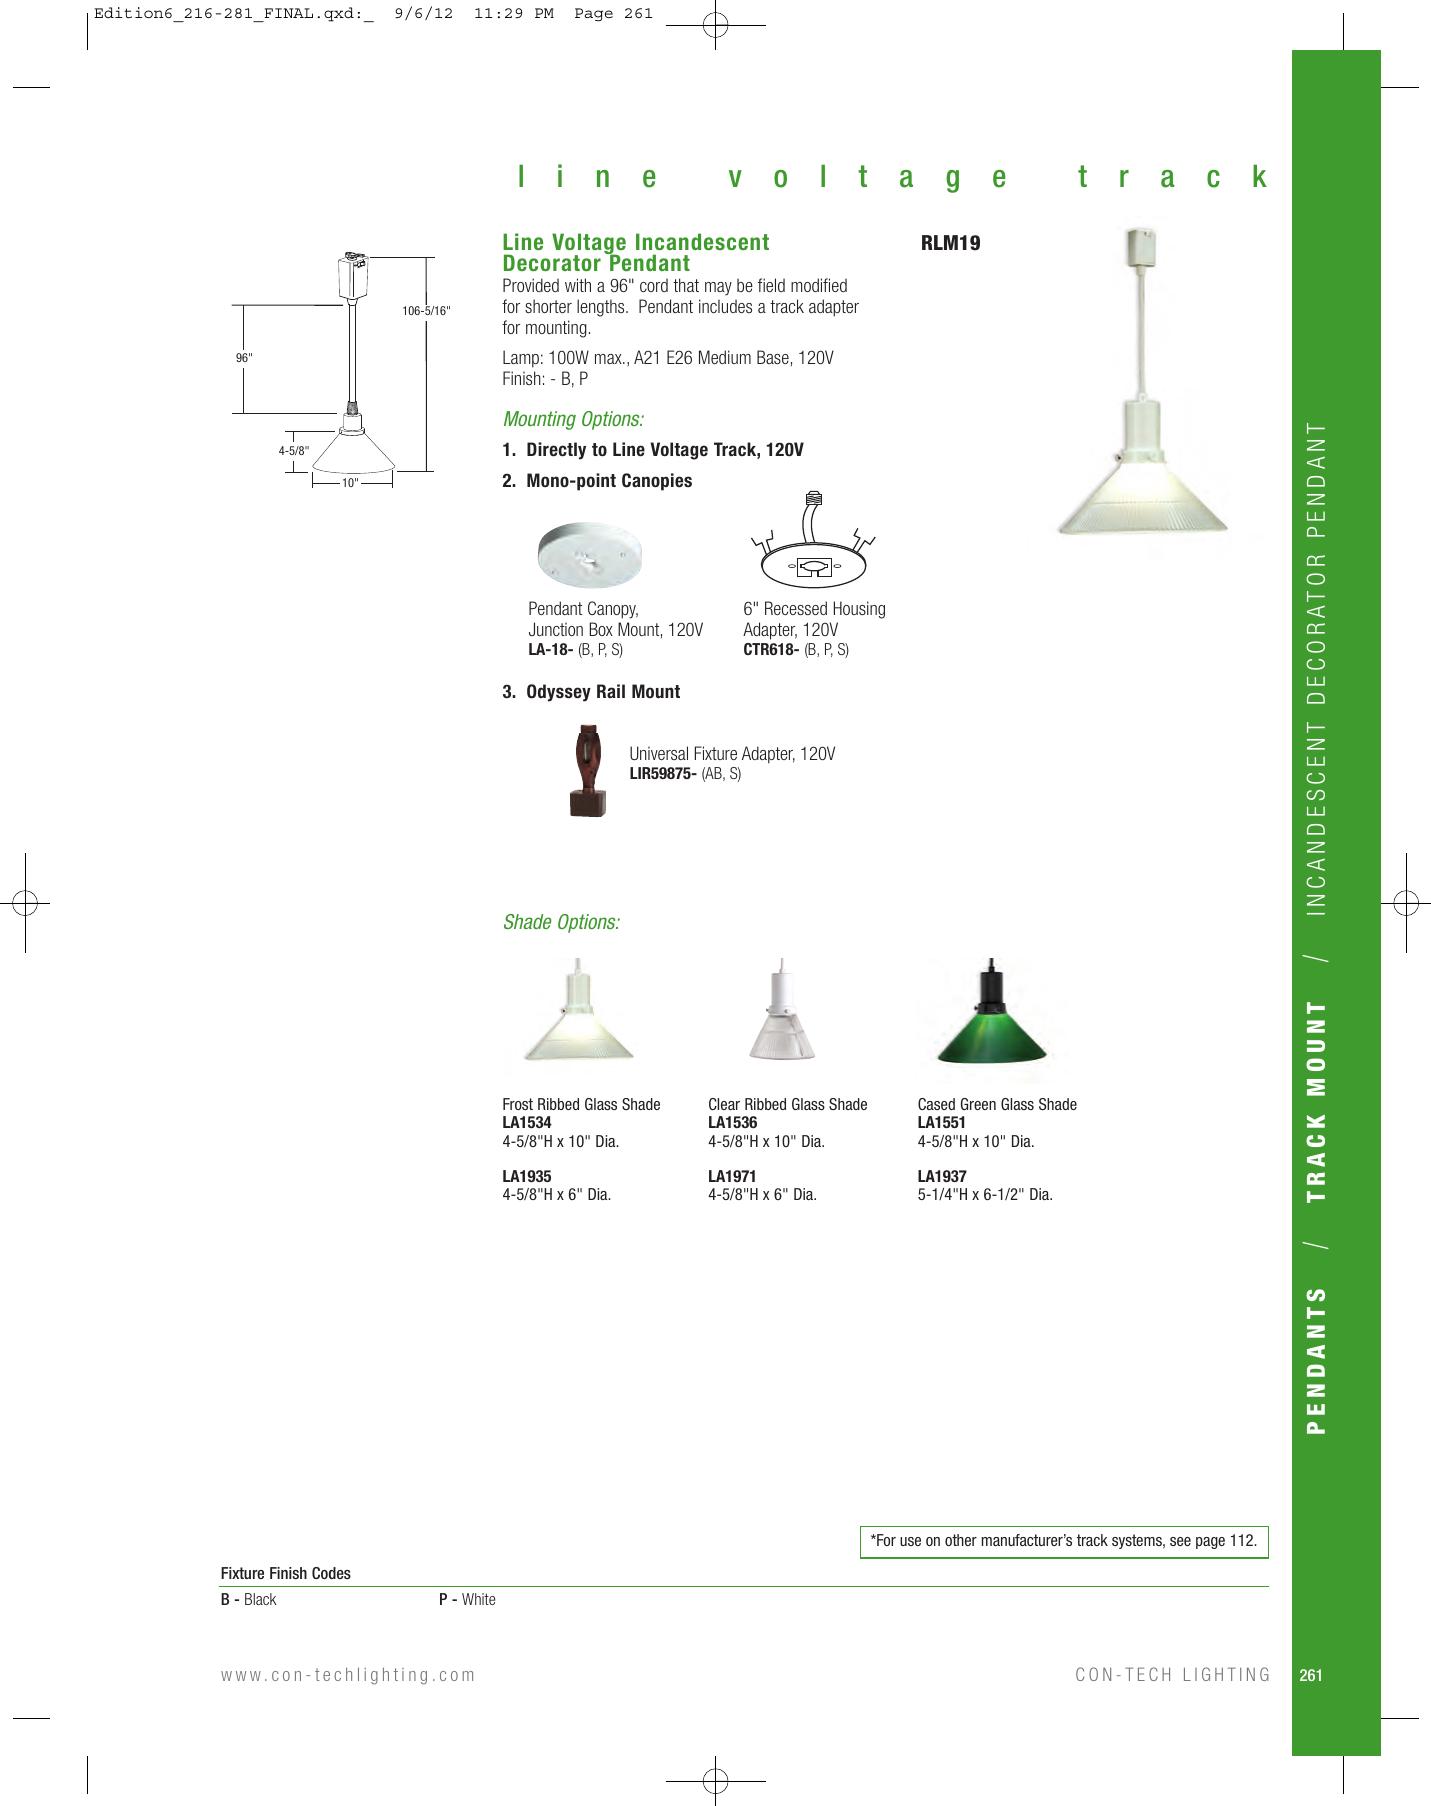 Txt 112341 Catalog on e1 wiring diagram, led wiring diagram, 3 lamp ballast wiring diagram, t35 wiring diagram, lithonia lighting wiring diagram, 240v ballast wiring diagram, electronic ballast wiring diagram, t12 wiring diagram, a2 wiring diagram, l3 wiring diagram, h4 wiring diagram, t56 wiring diagram, d2 wiring diagram, t1 wiring diagram, rapid start ballast wiring diagram, two light wiring diagram, marine inverter wiring diagram, t8 wiring diagram, o2 wiring diagram, g6 wiring diagram,